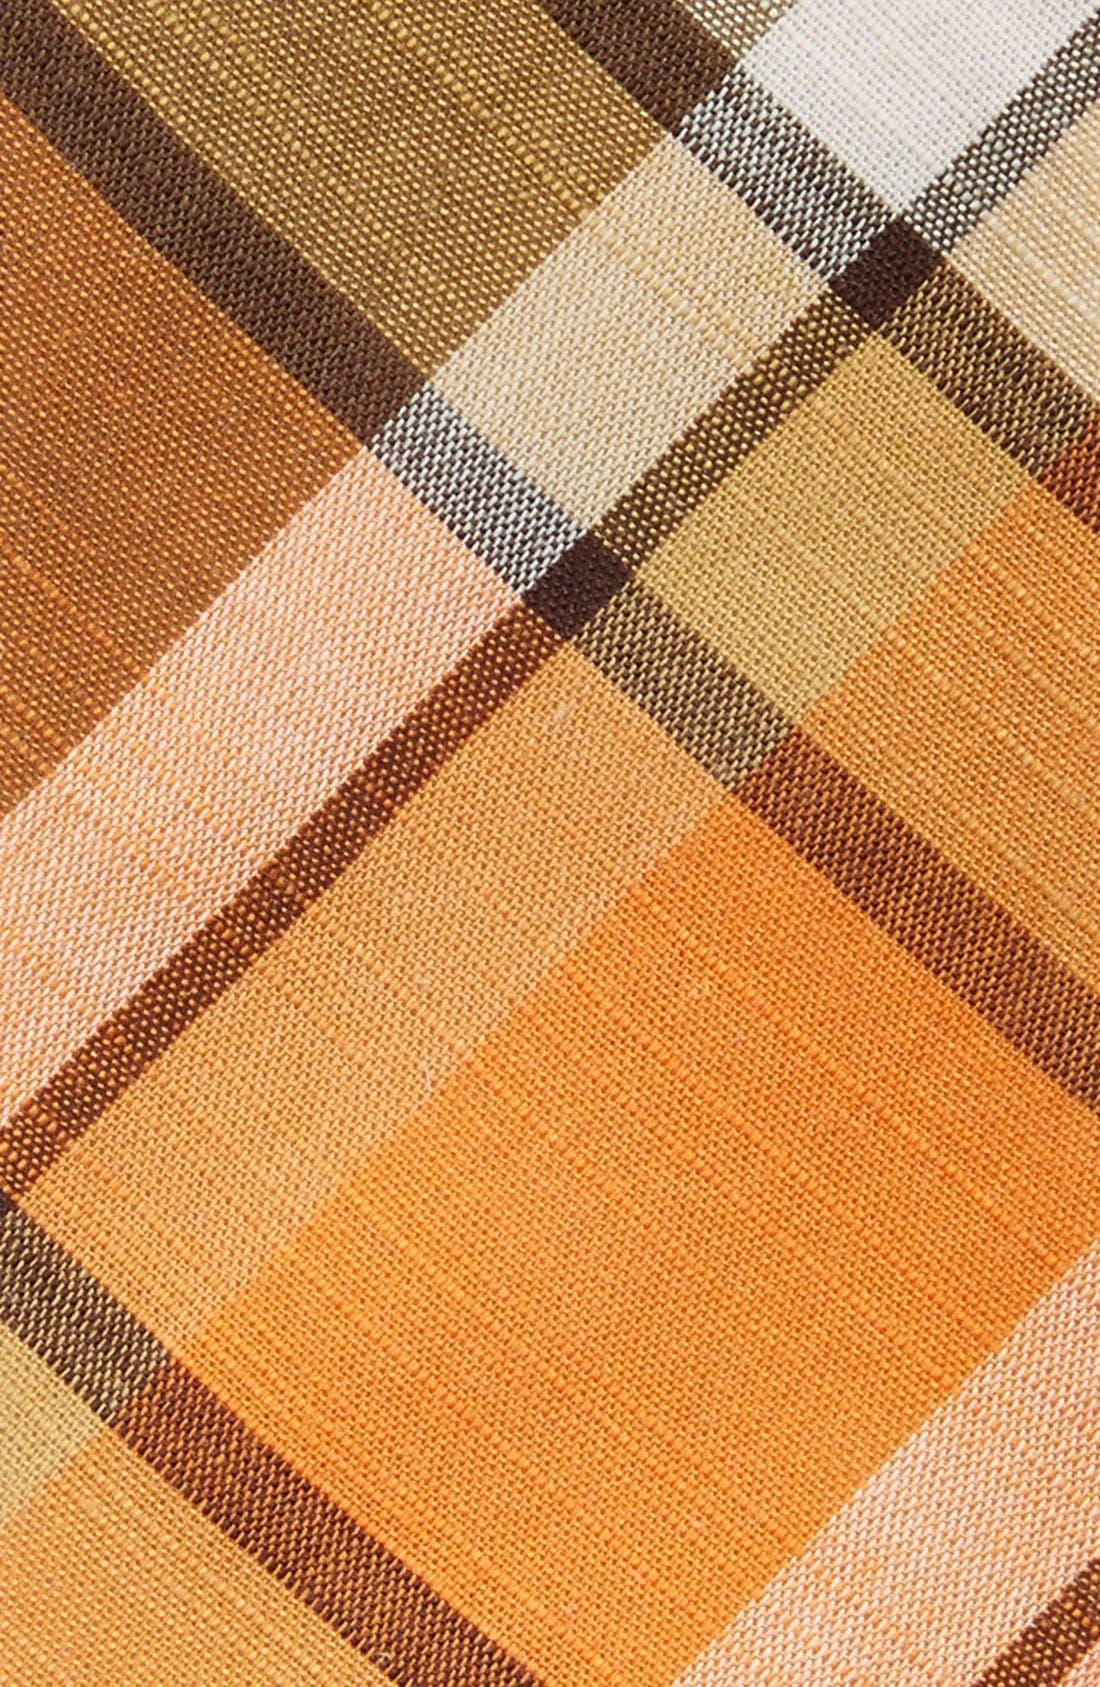 Alternate Image 2  - Original Penguin Woven Cotton Tie